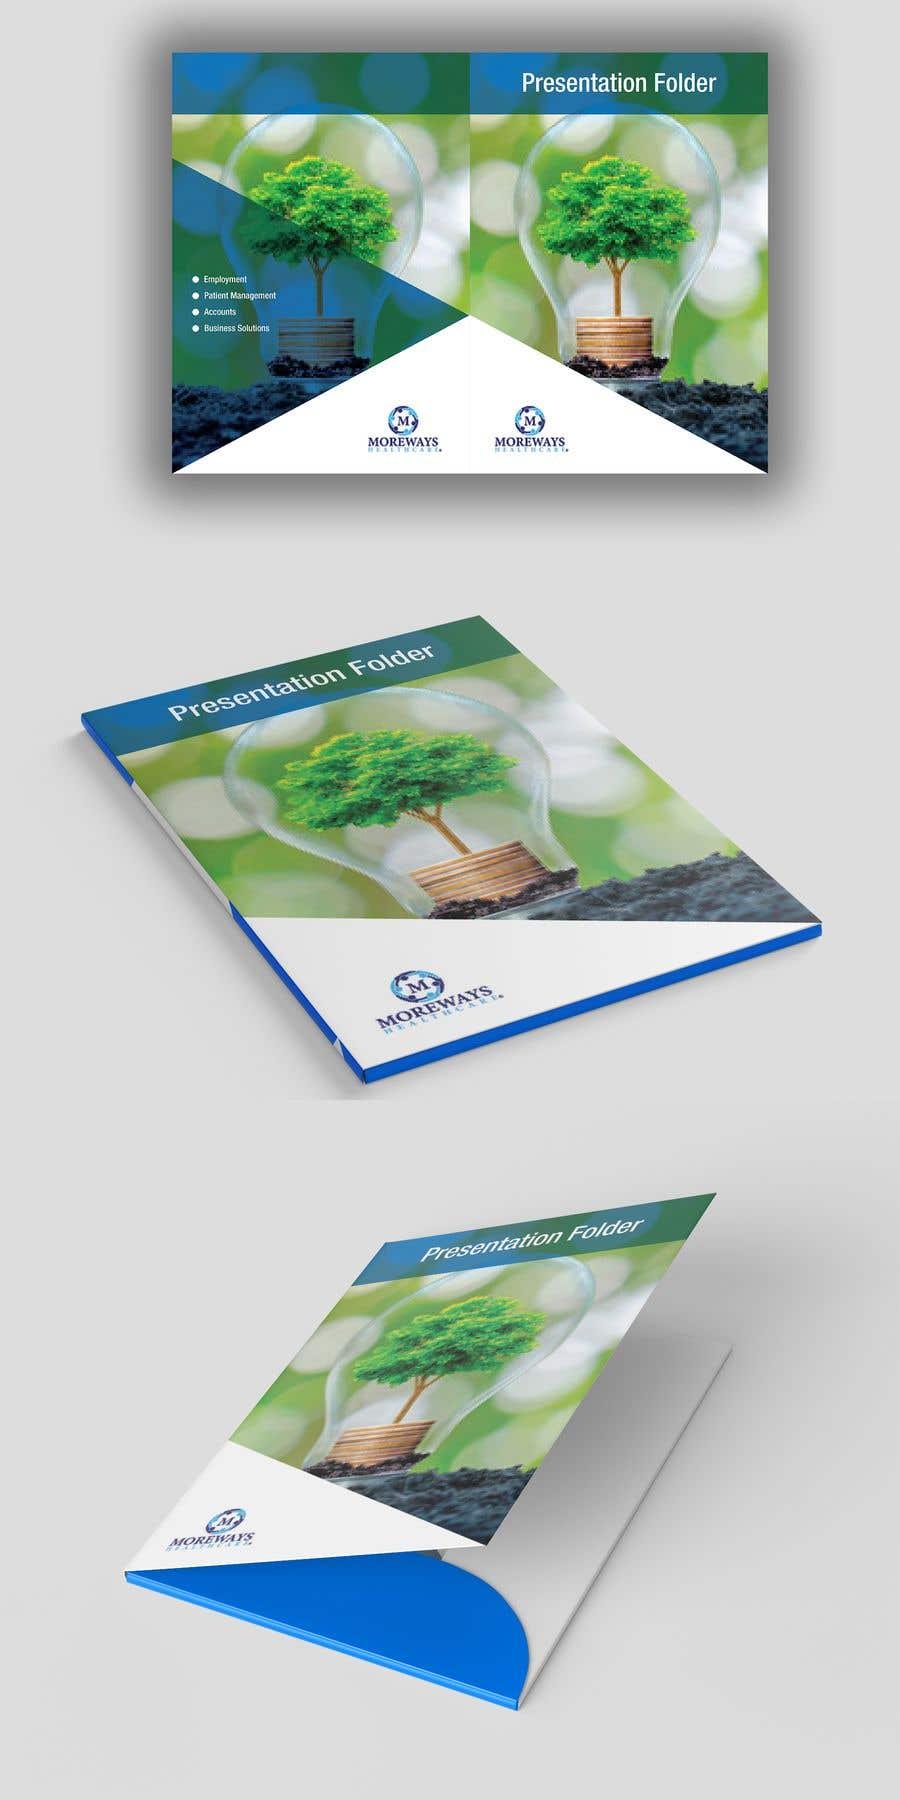 Contest Entry #                                        1                                      for                                         Design an A4 presentation folder